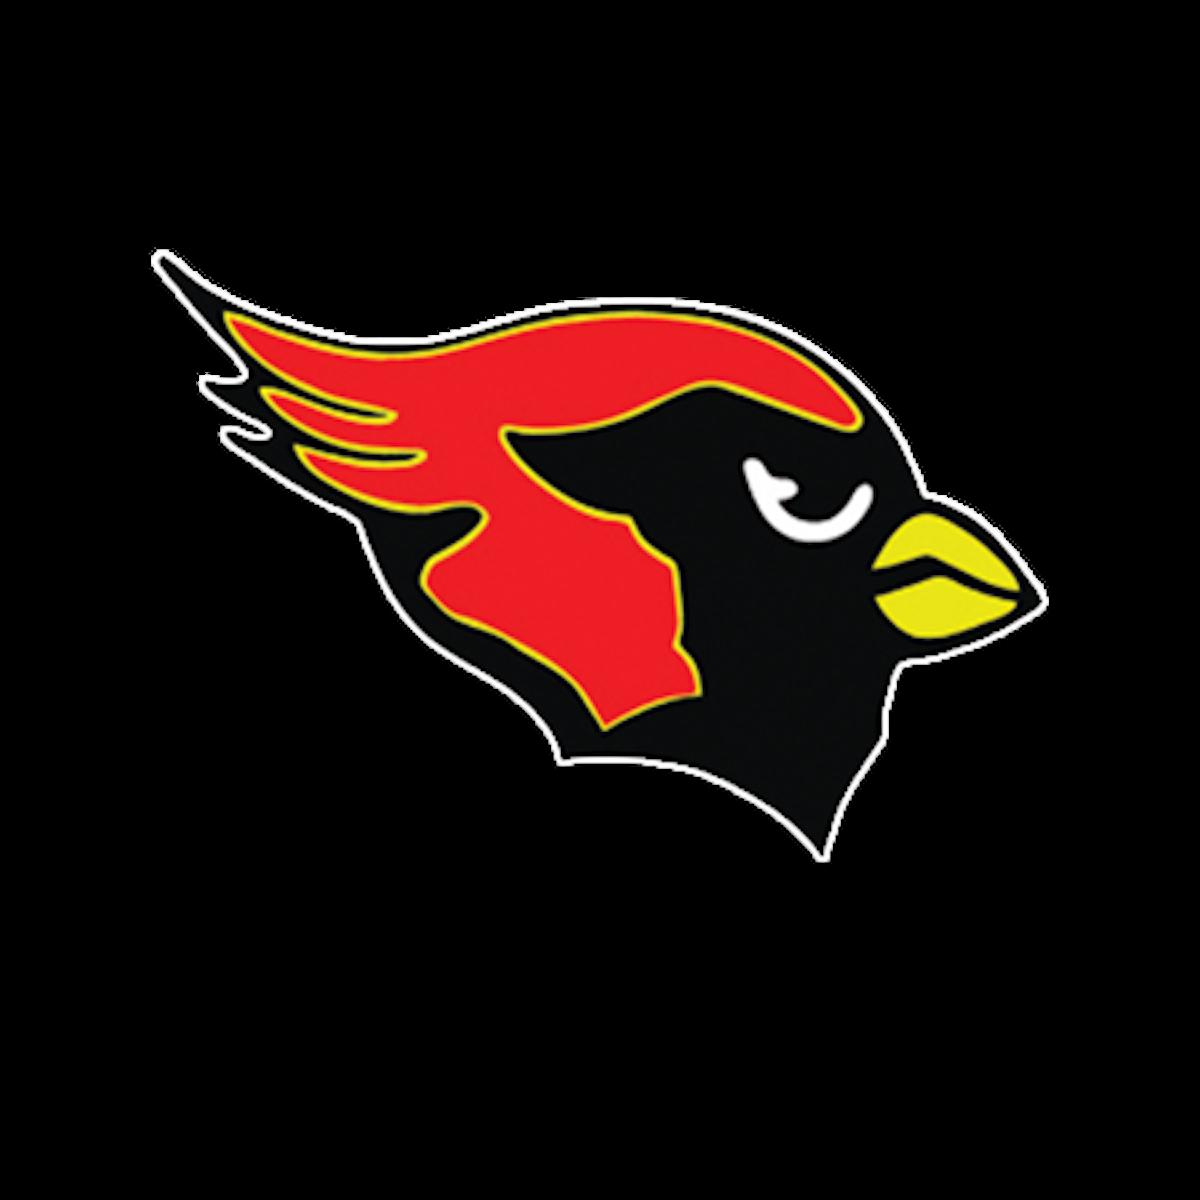 Melissa Cardinals | SportsDayHS.com